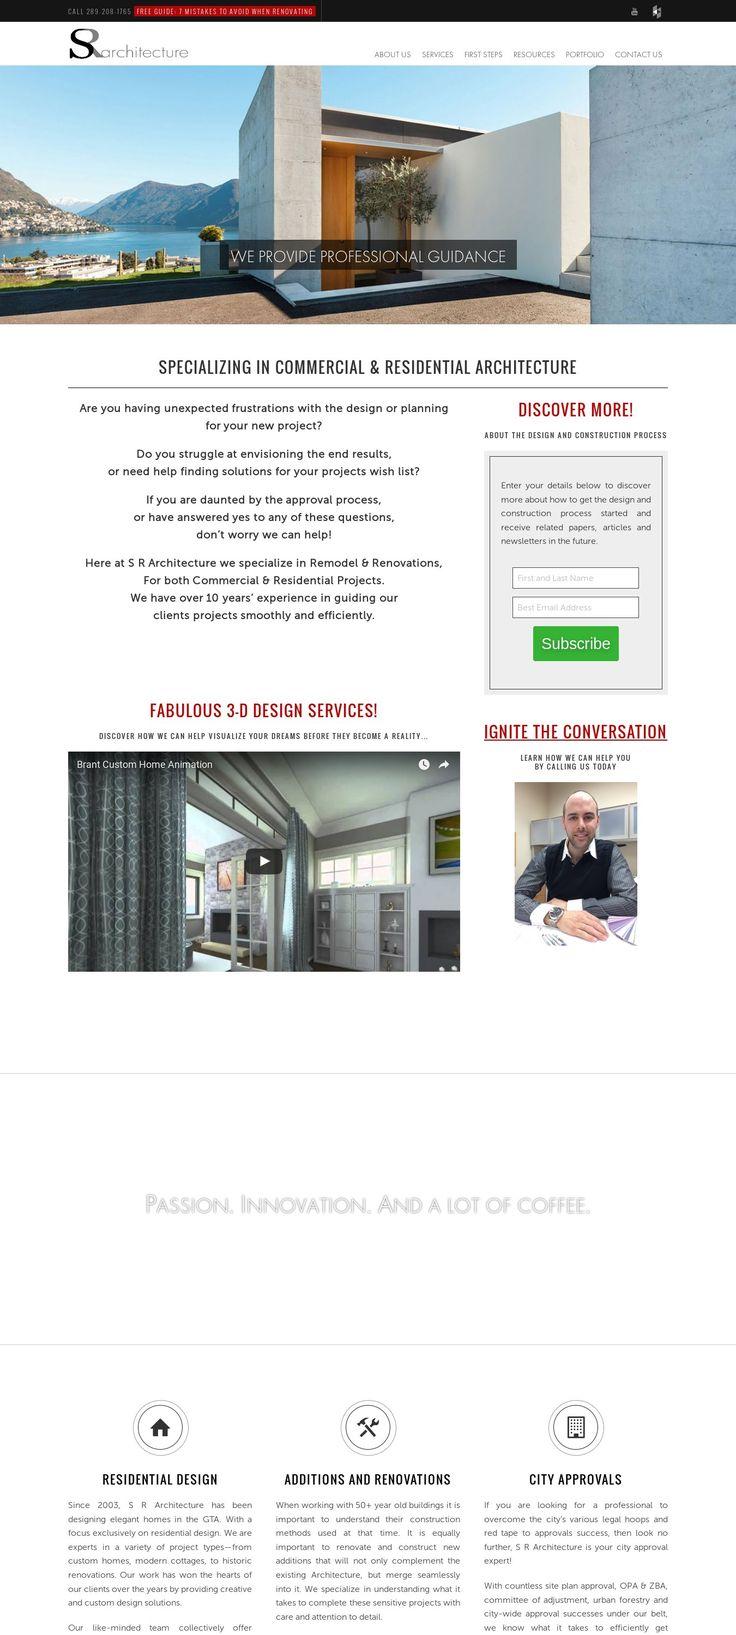 WordPress site srarchitecture.ca uses the Architect Marketing Group Template 1 best wordpress theme